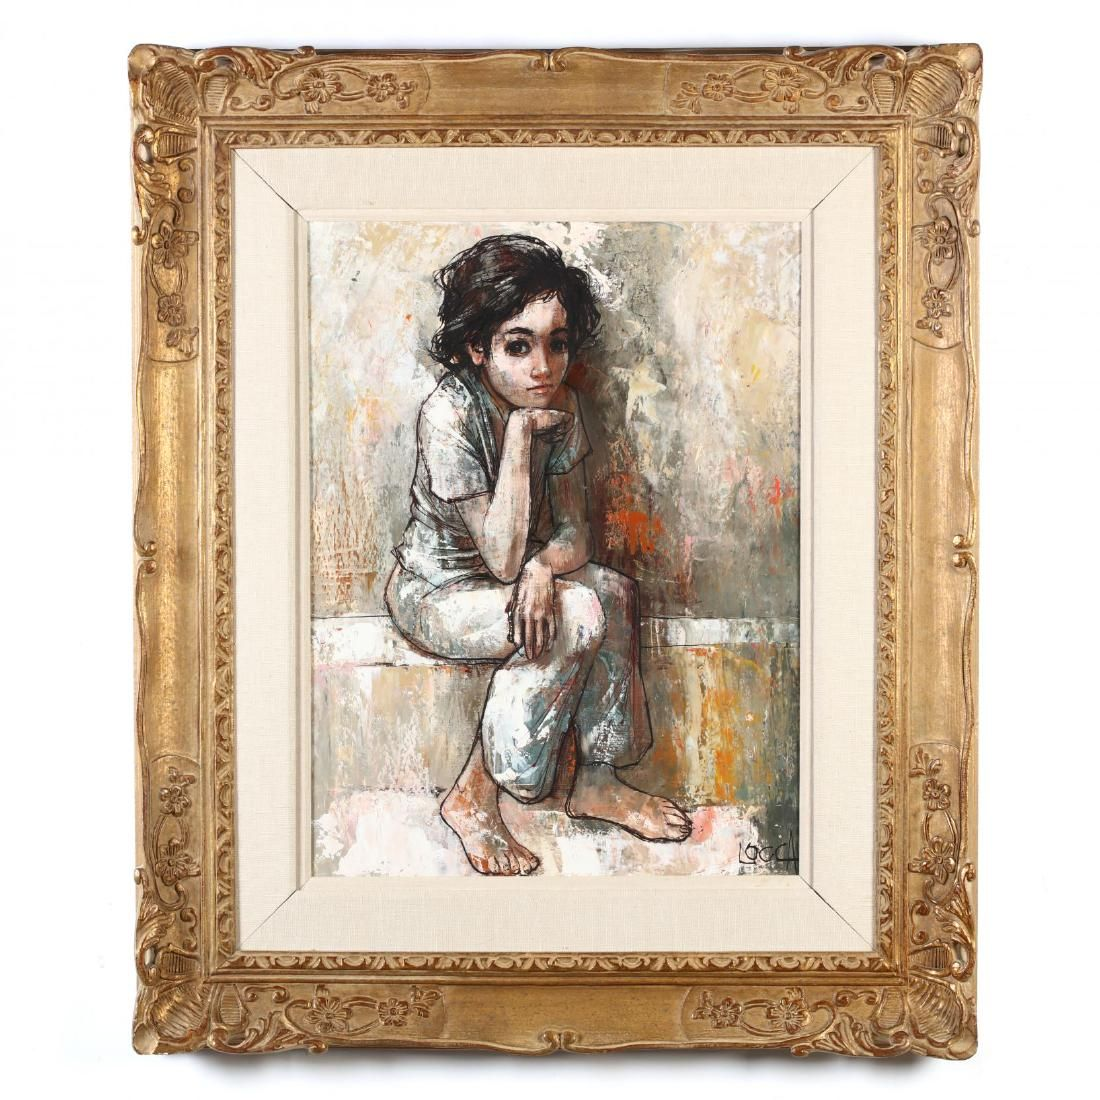 Bernard Locca (Italian, 1926-1997), A Young Boy in